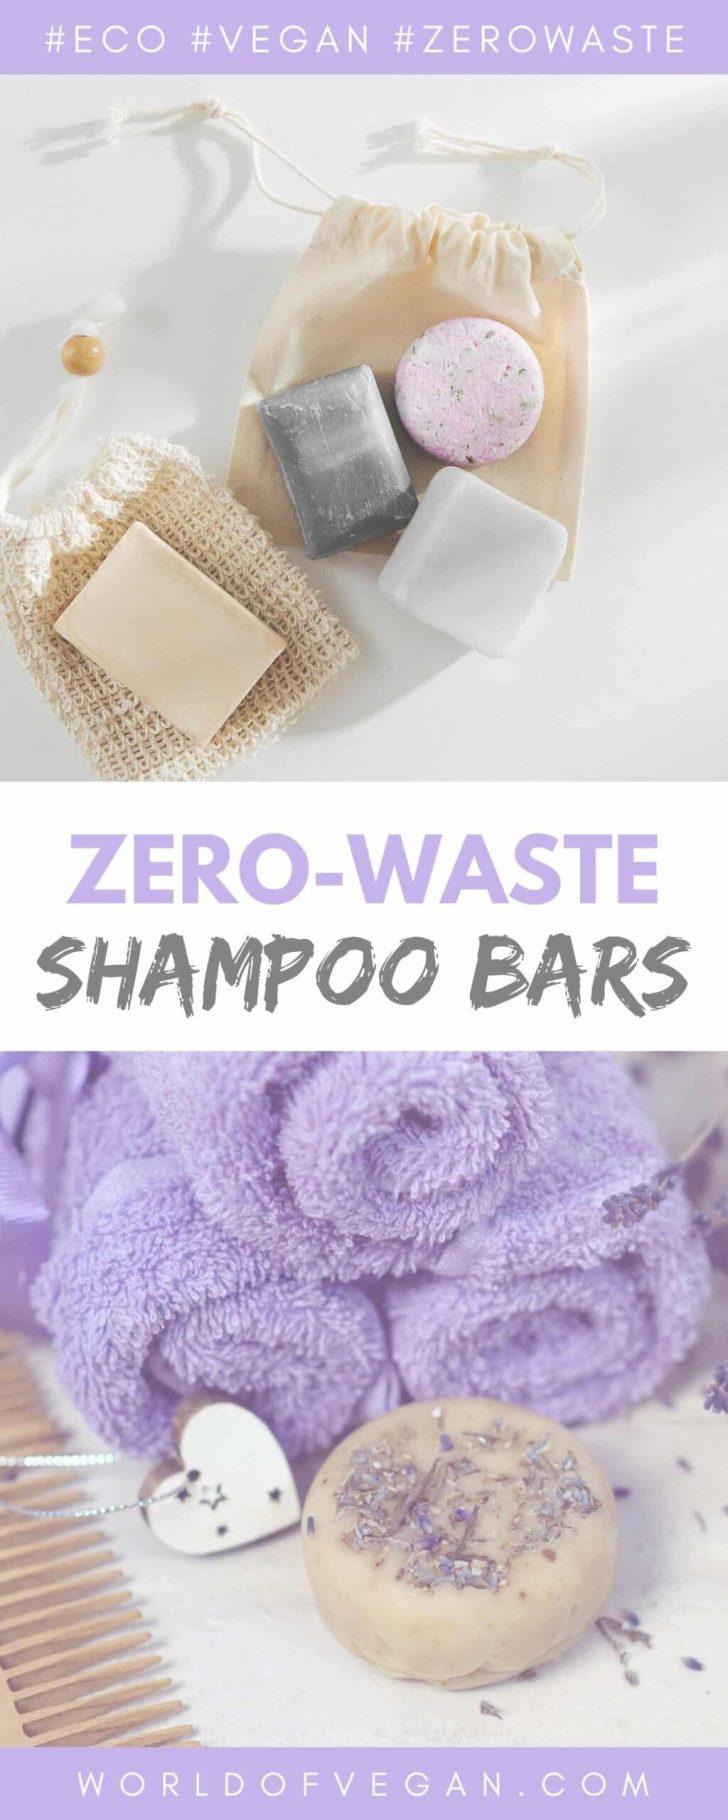 Best Vegan Zero Waste Shampoo Bars Photo